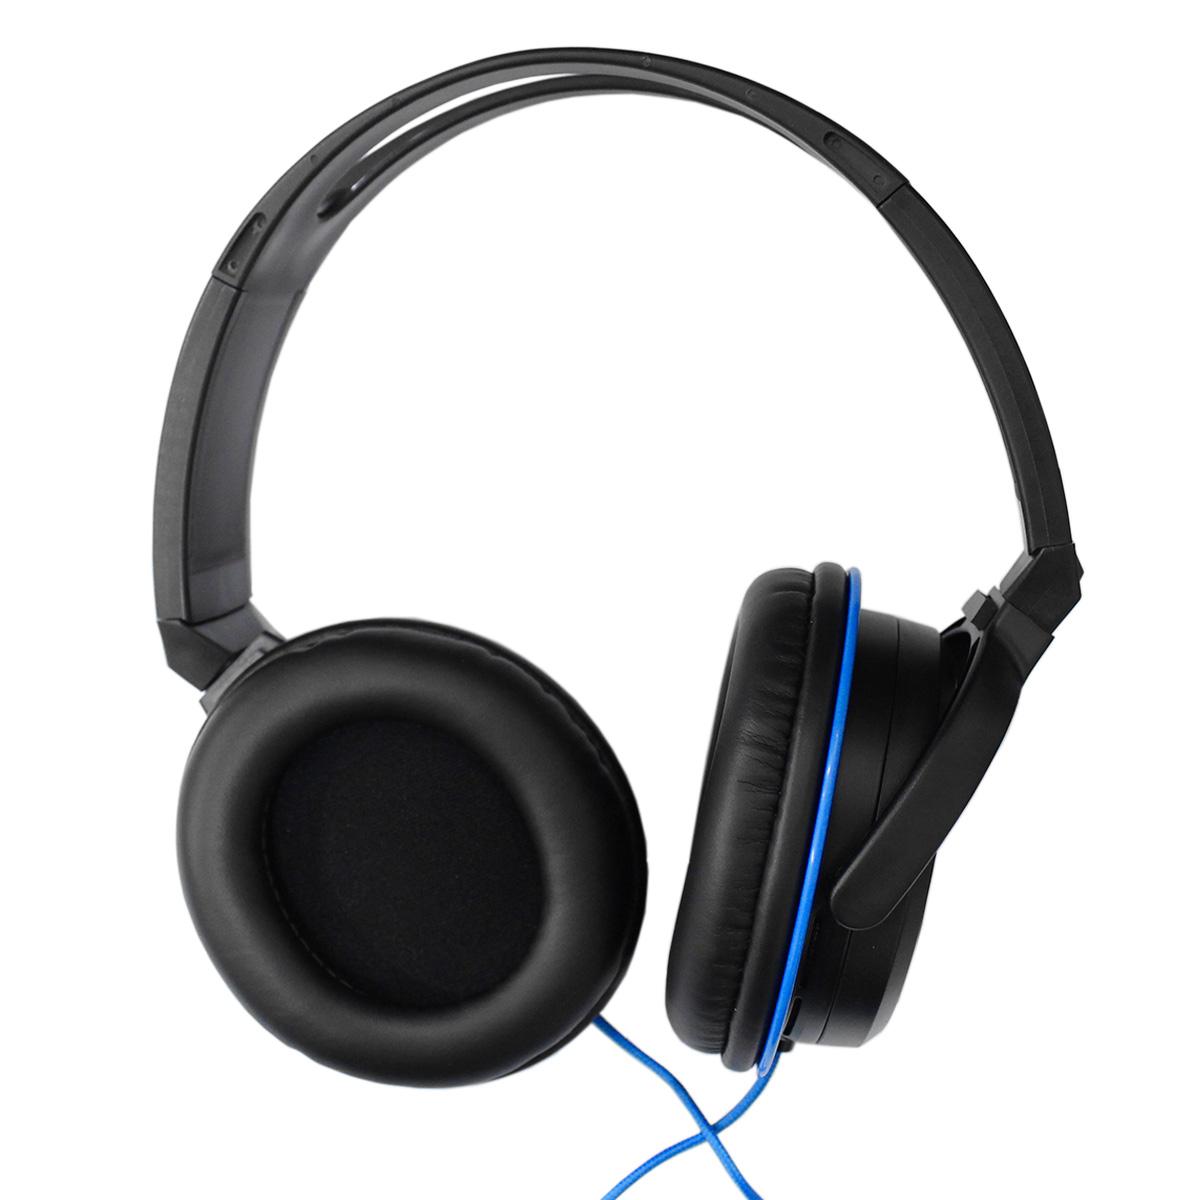 CD680S - Fone de Ouvido Over-ear CD 680 S Azul - Yoga